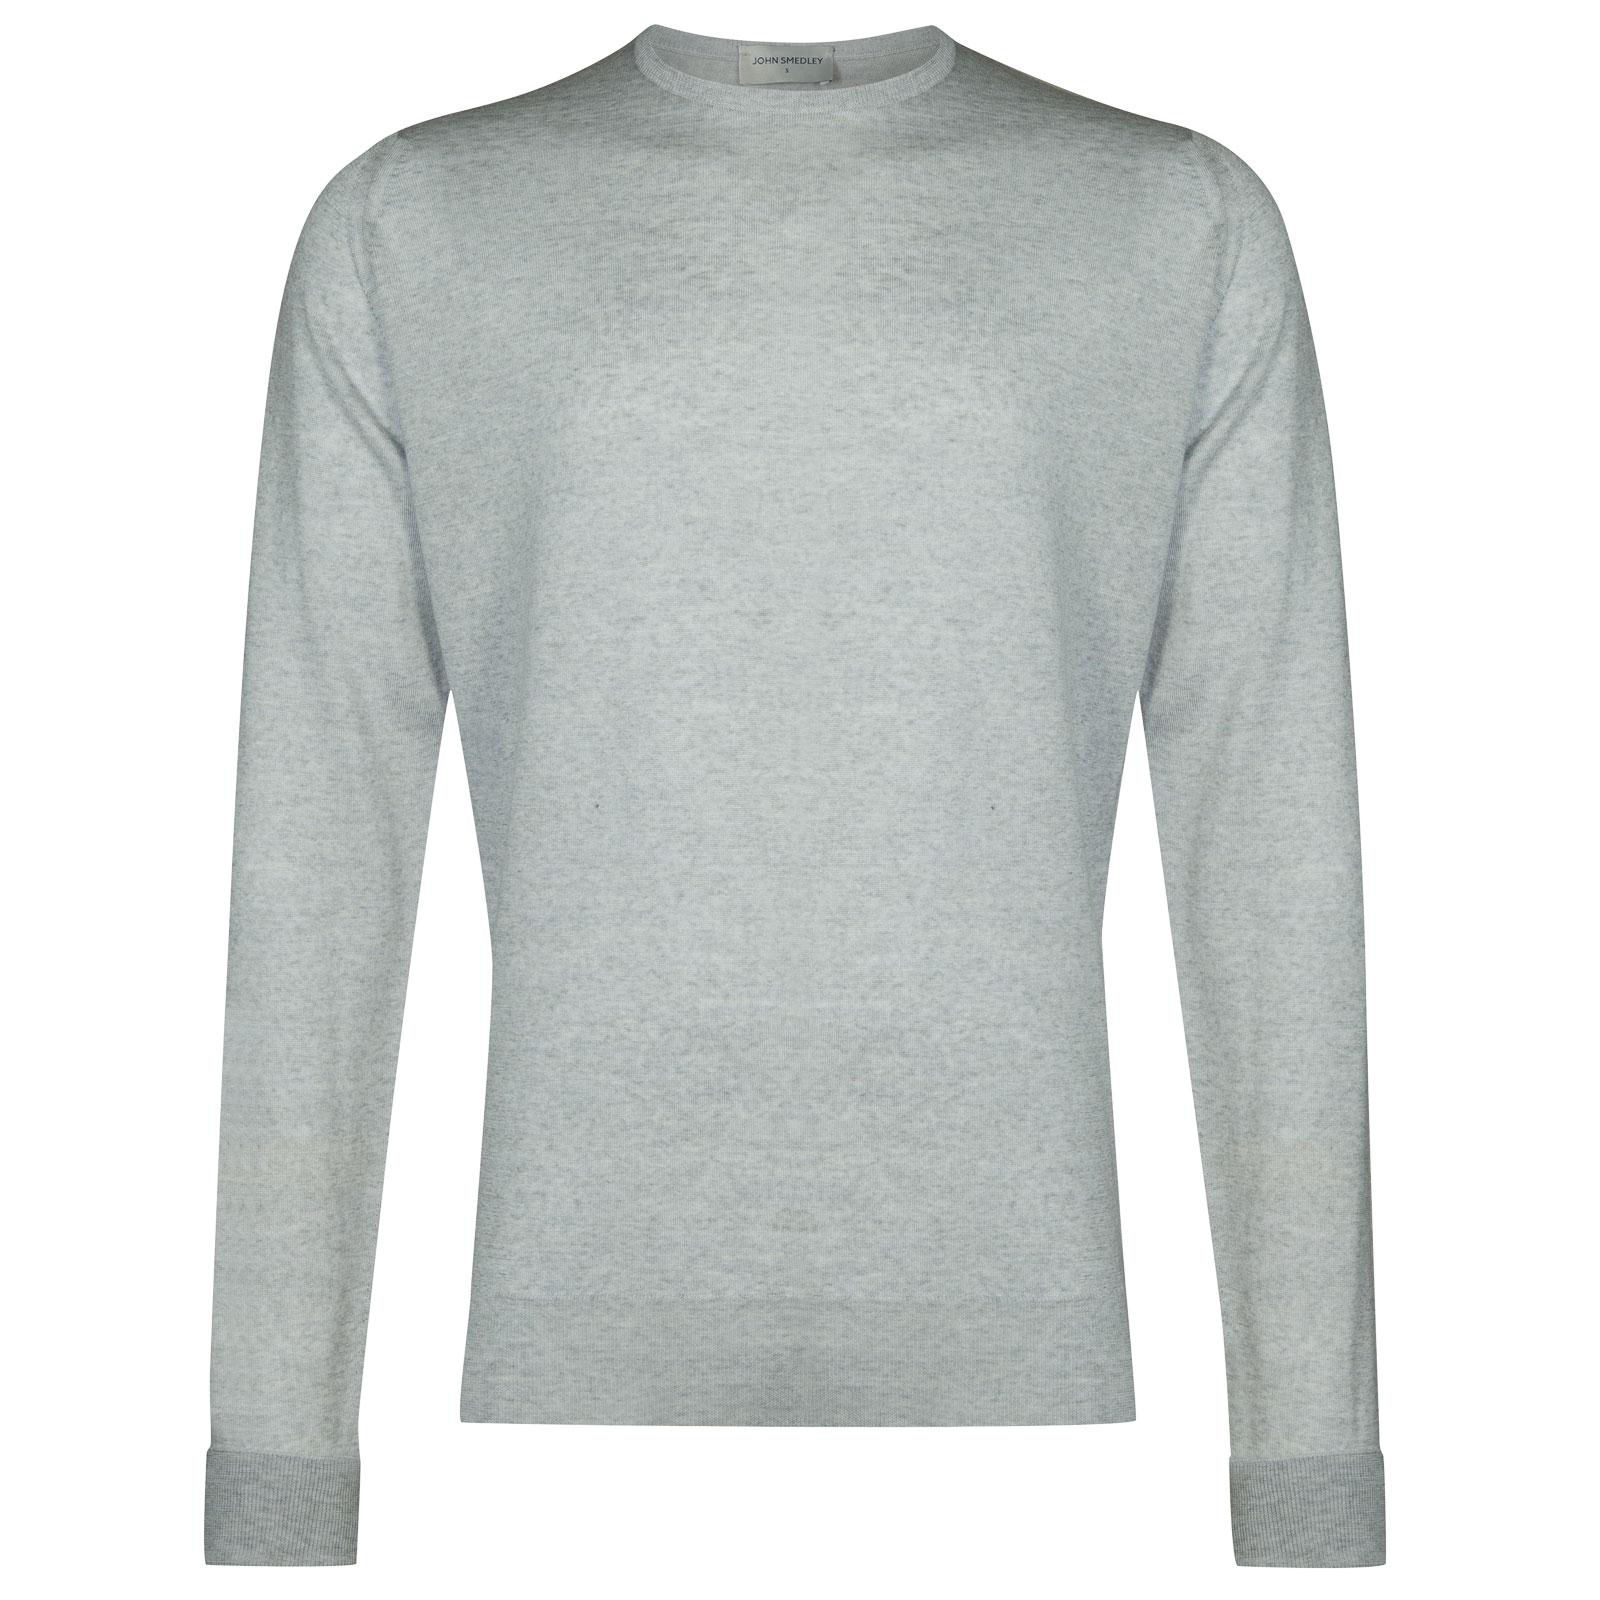 John Smedley marcus Merino Wool Pullover in Bardot Grey-S